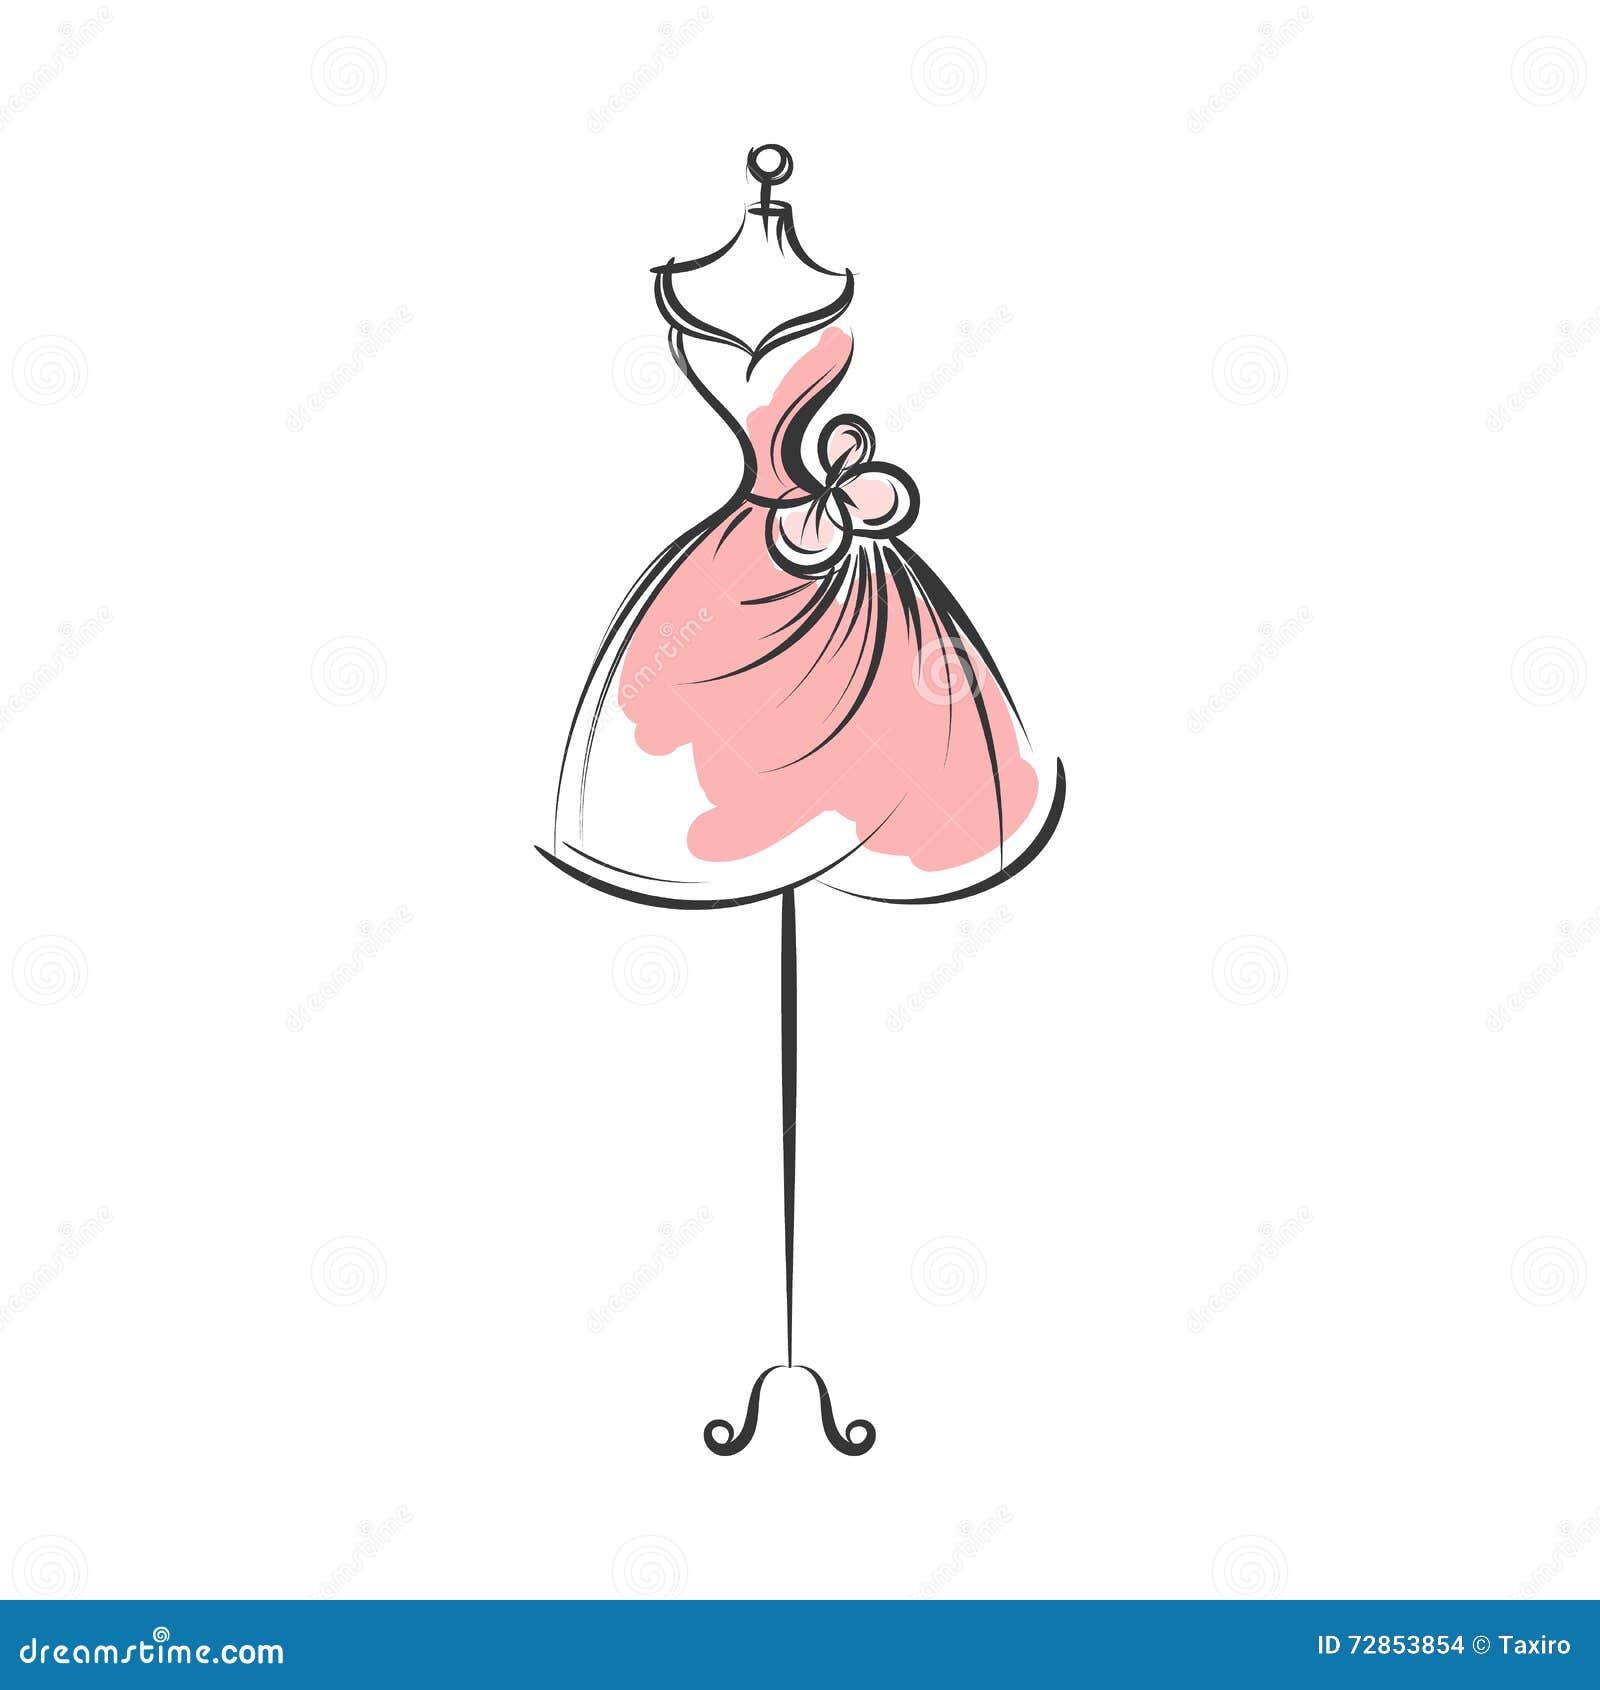 In Stock Weding Dreses 05 - In Stock Weding Dreses